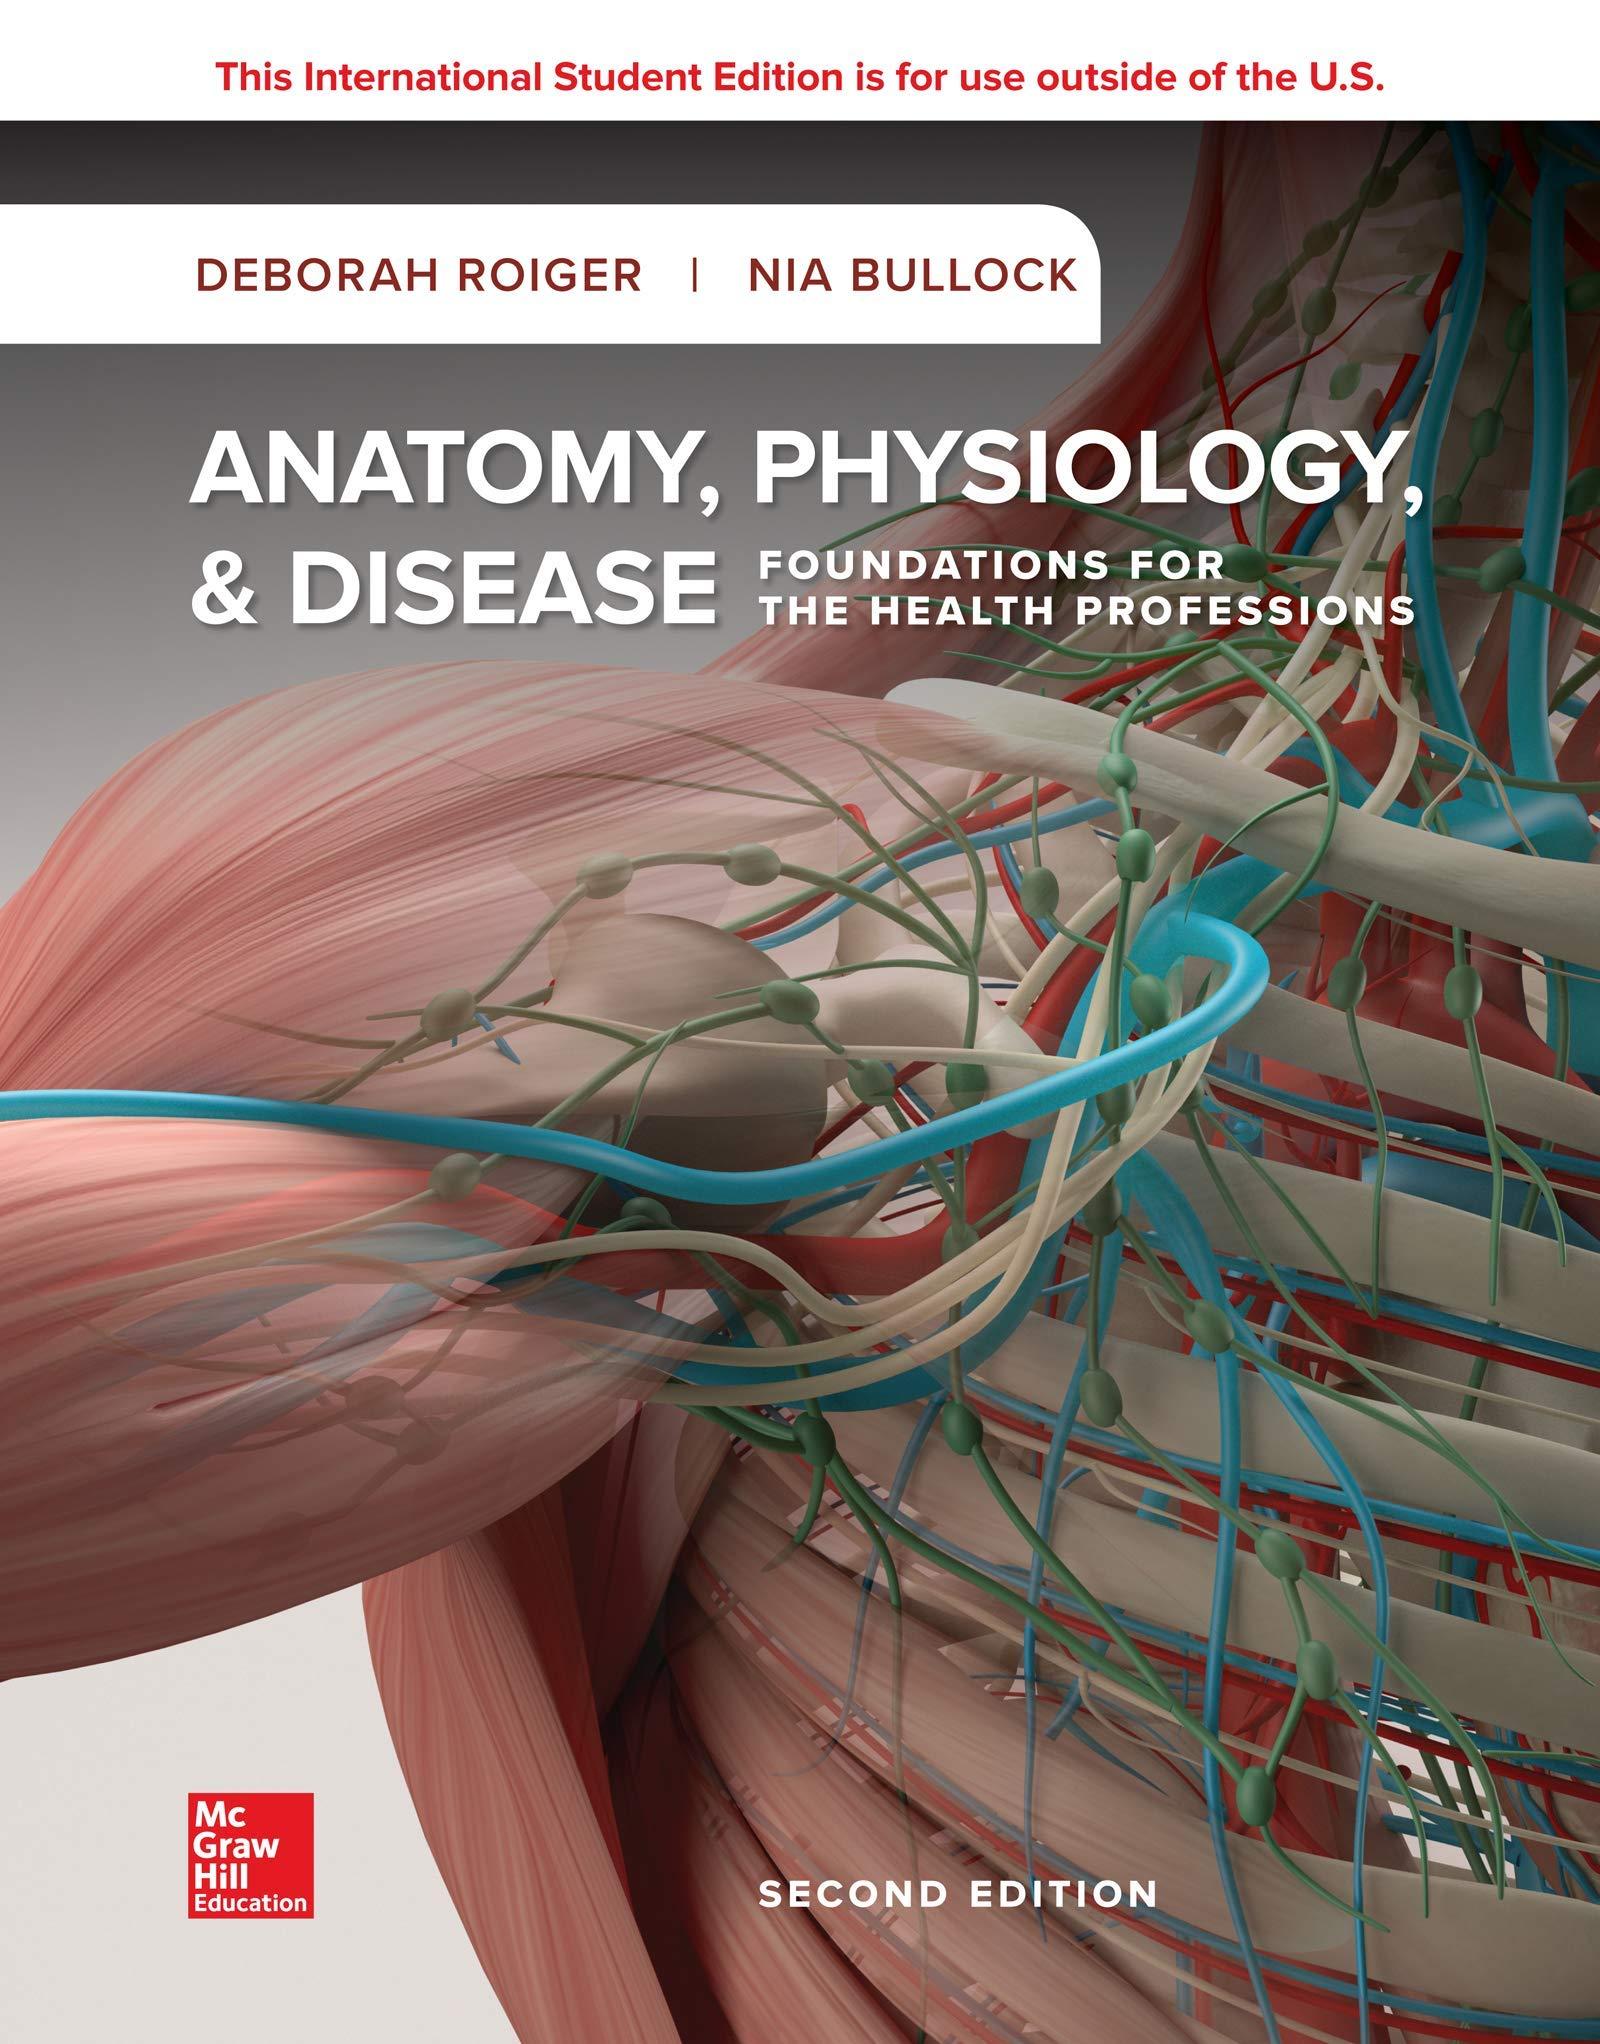 Anatomy, Physiology, & Disease: 9781260092264: Amazon.com: Books